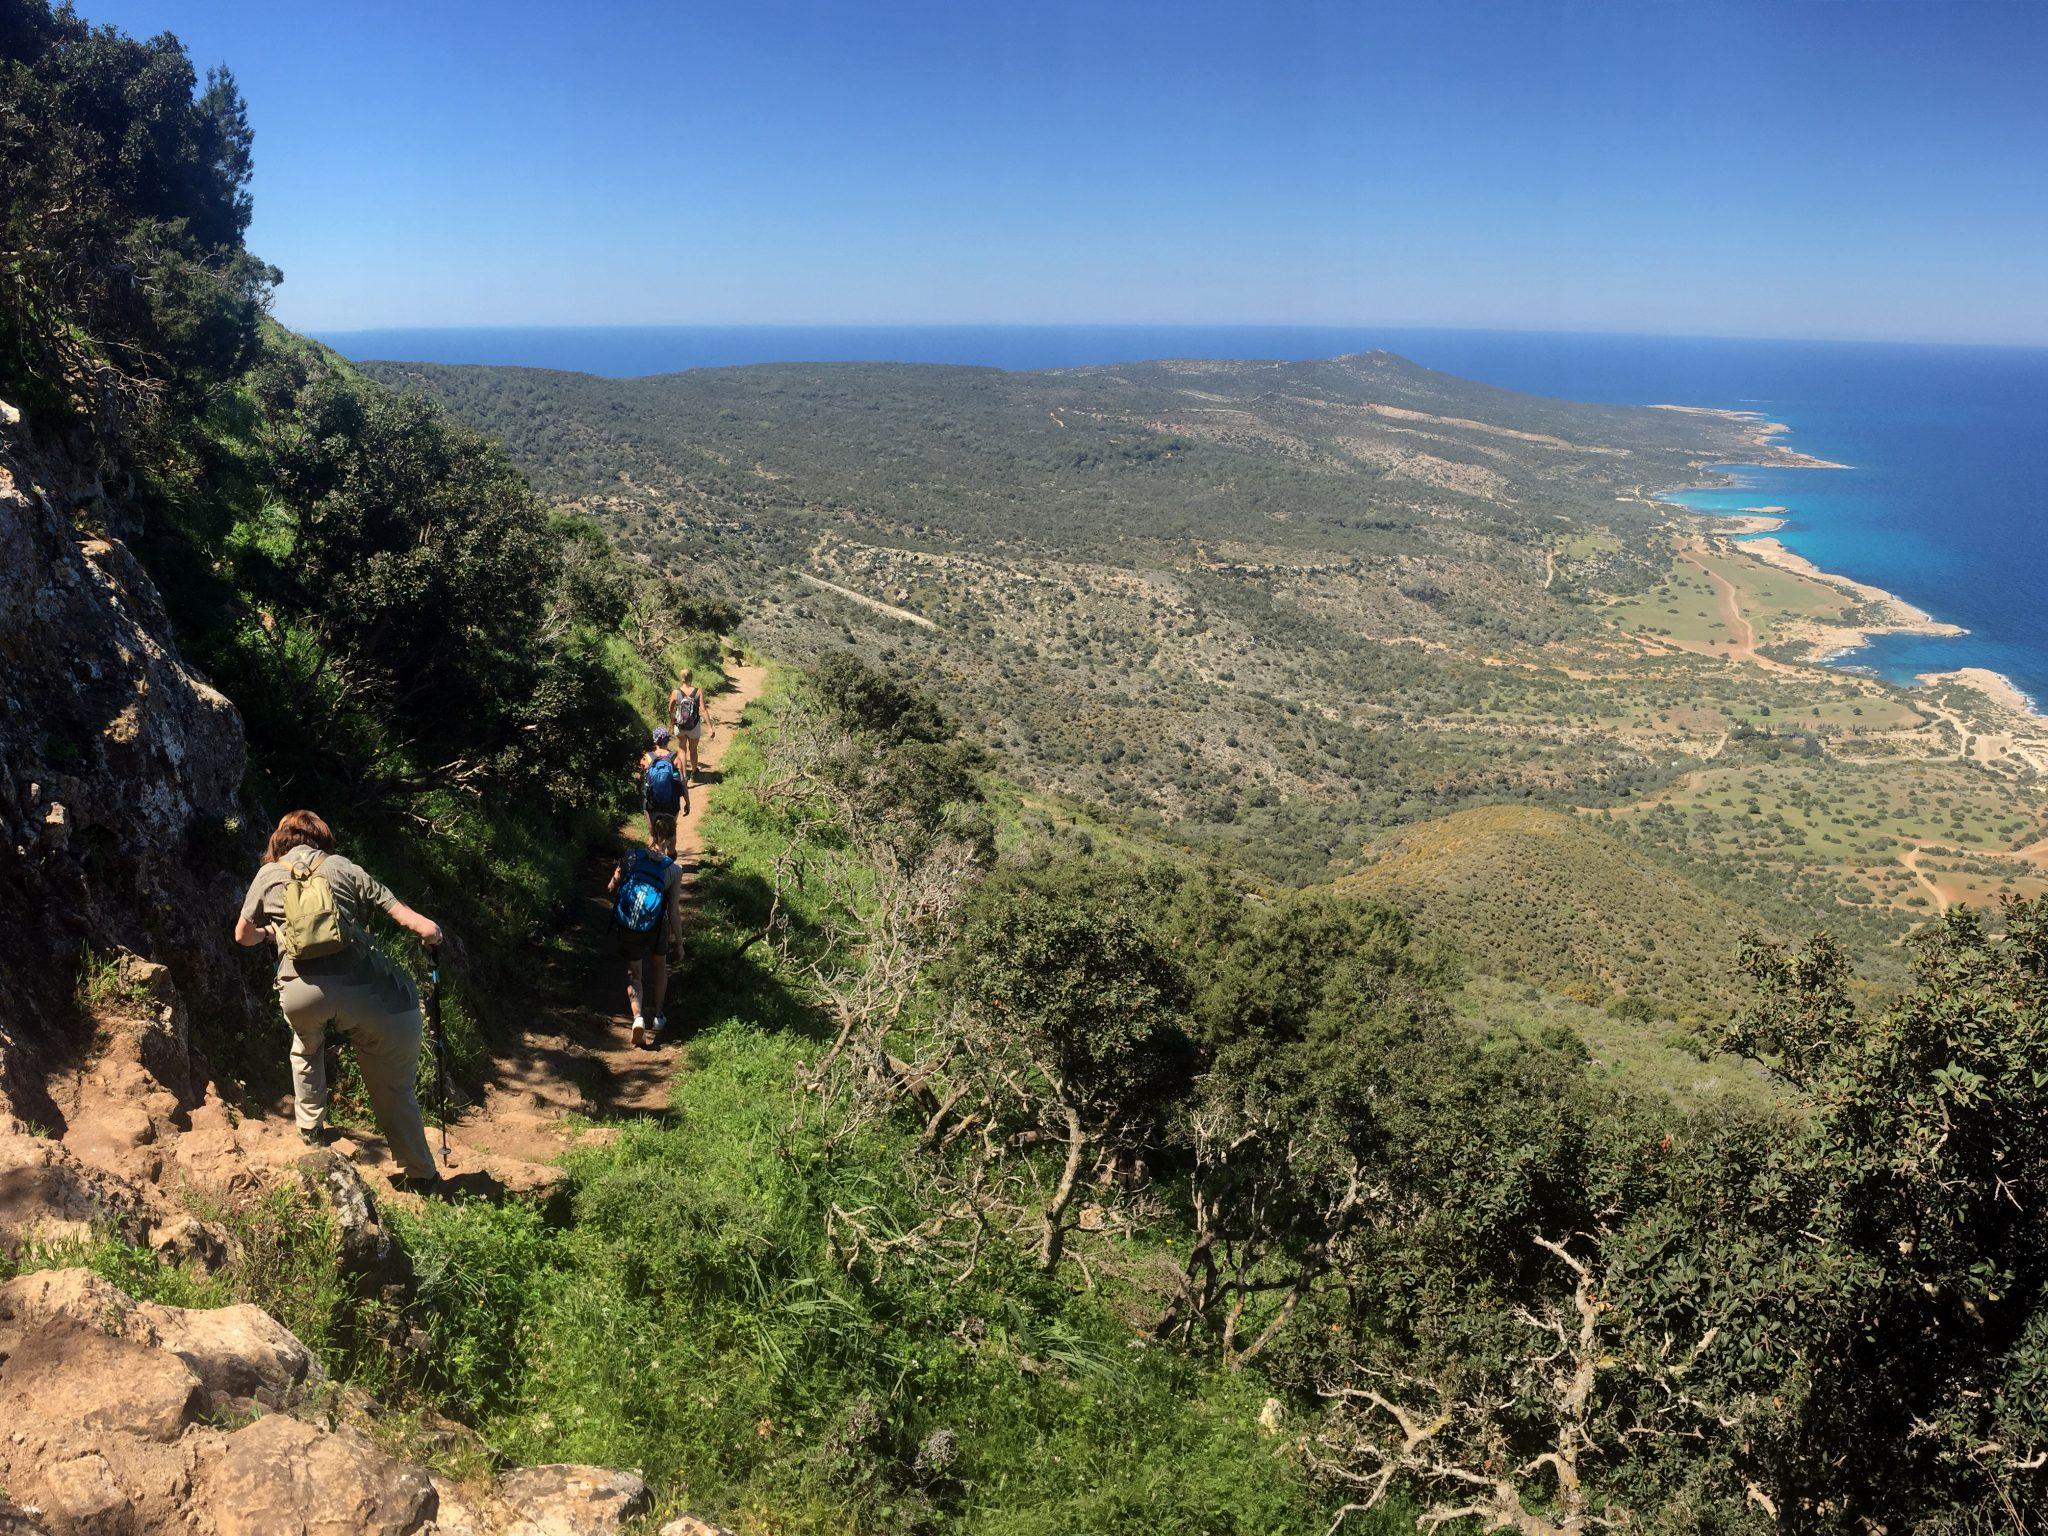 Akamas, Wandern, Wanderung, Aphrodite, trail, Mythologie, Zypern, Polis Chrysochous, Pafos, Paphos, Wandern auf Zypern,